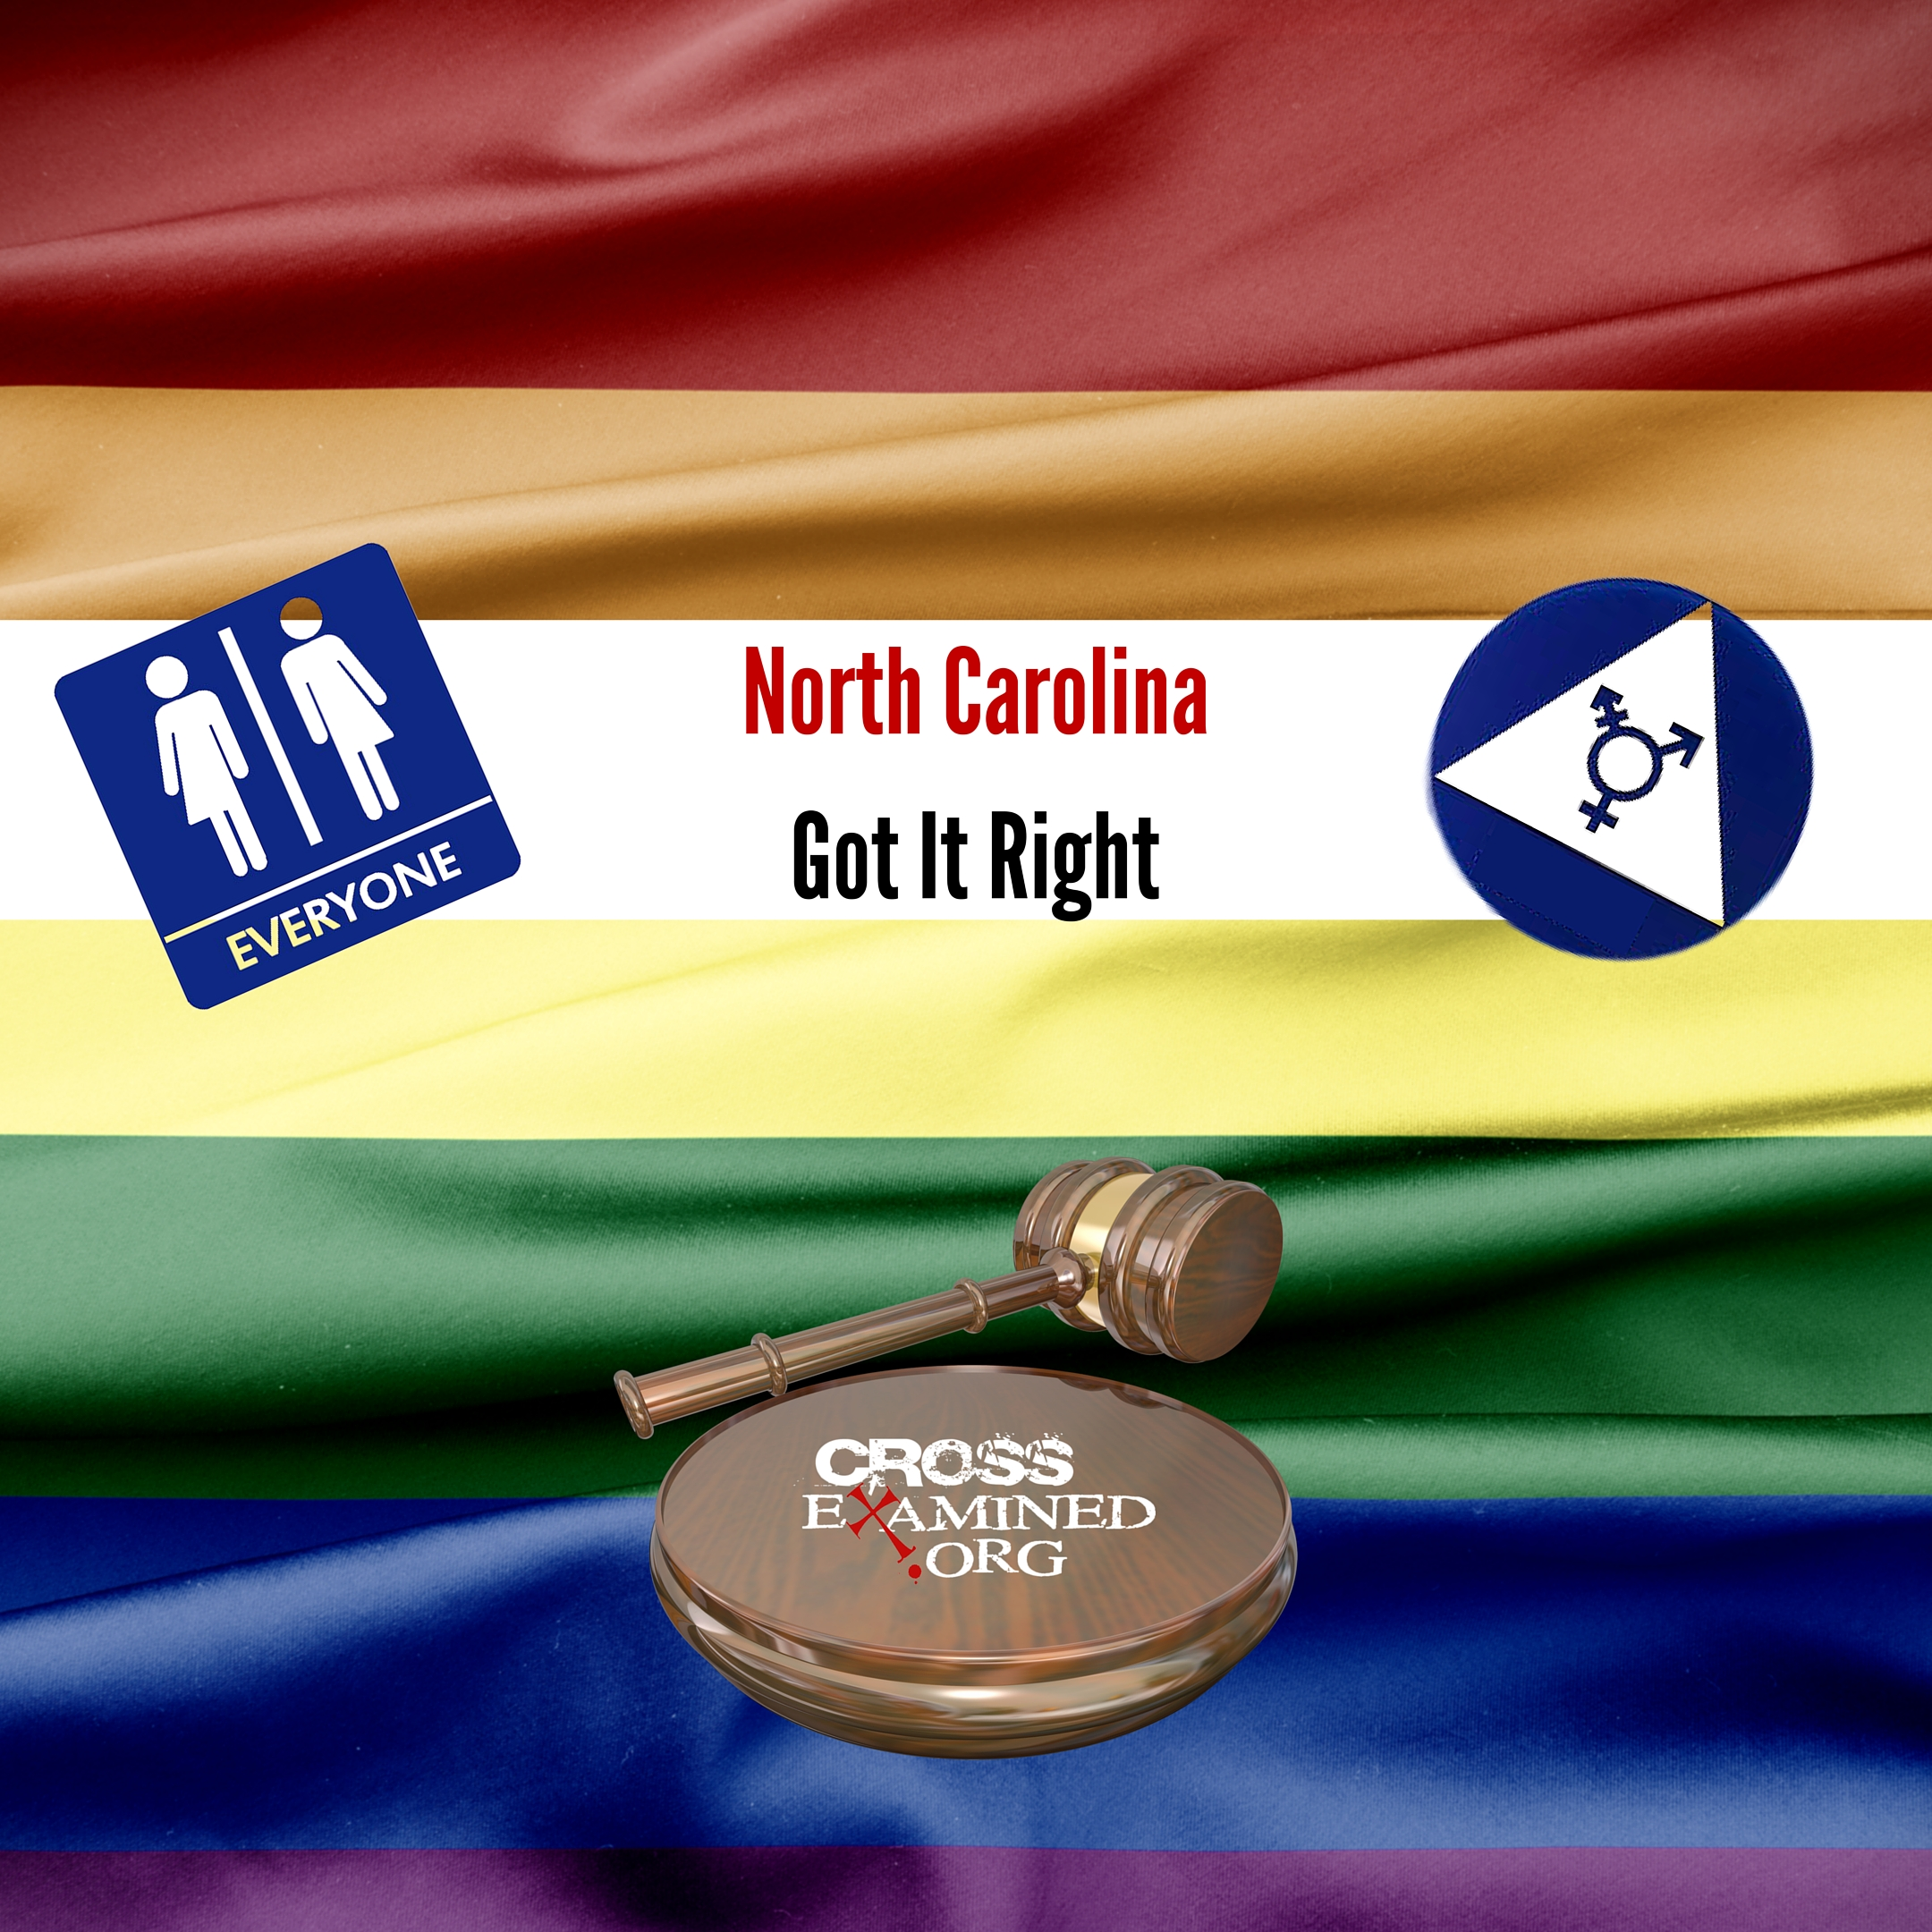 Six Reasons North Carolina Got It Right